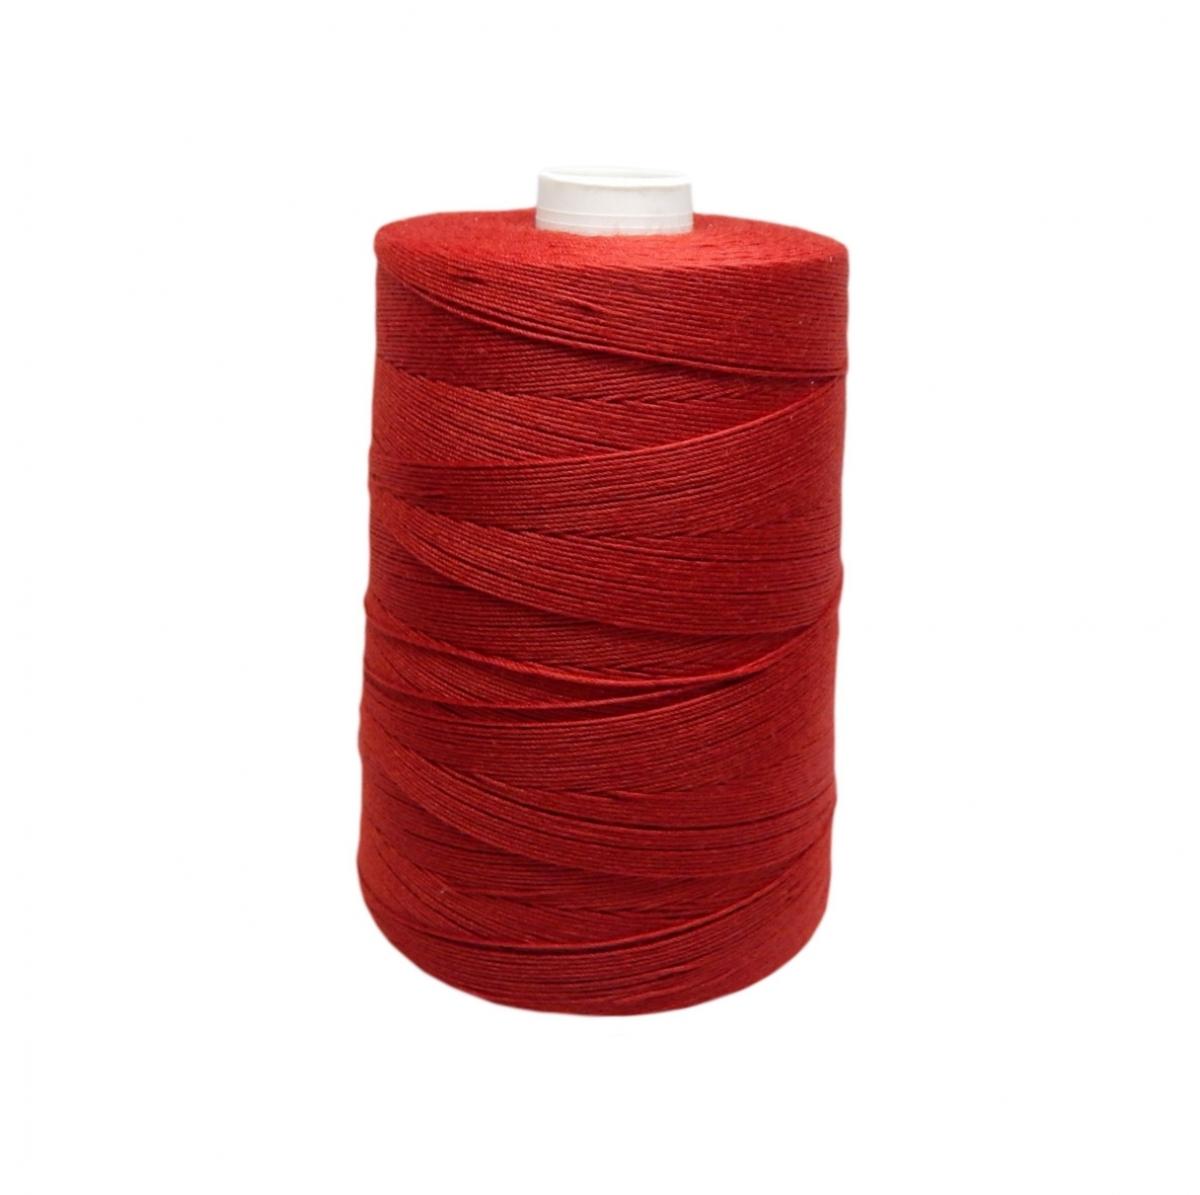 Yarn for rug warp